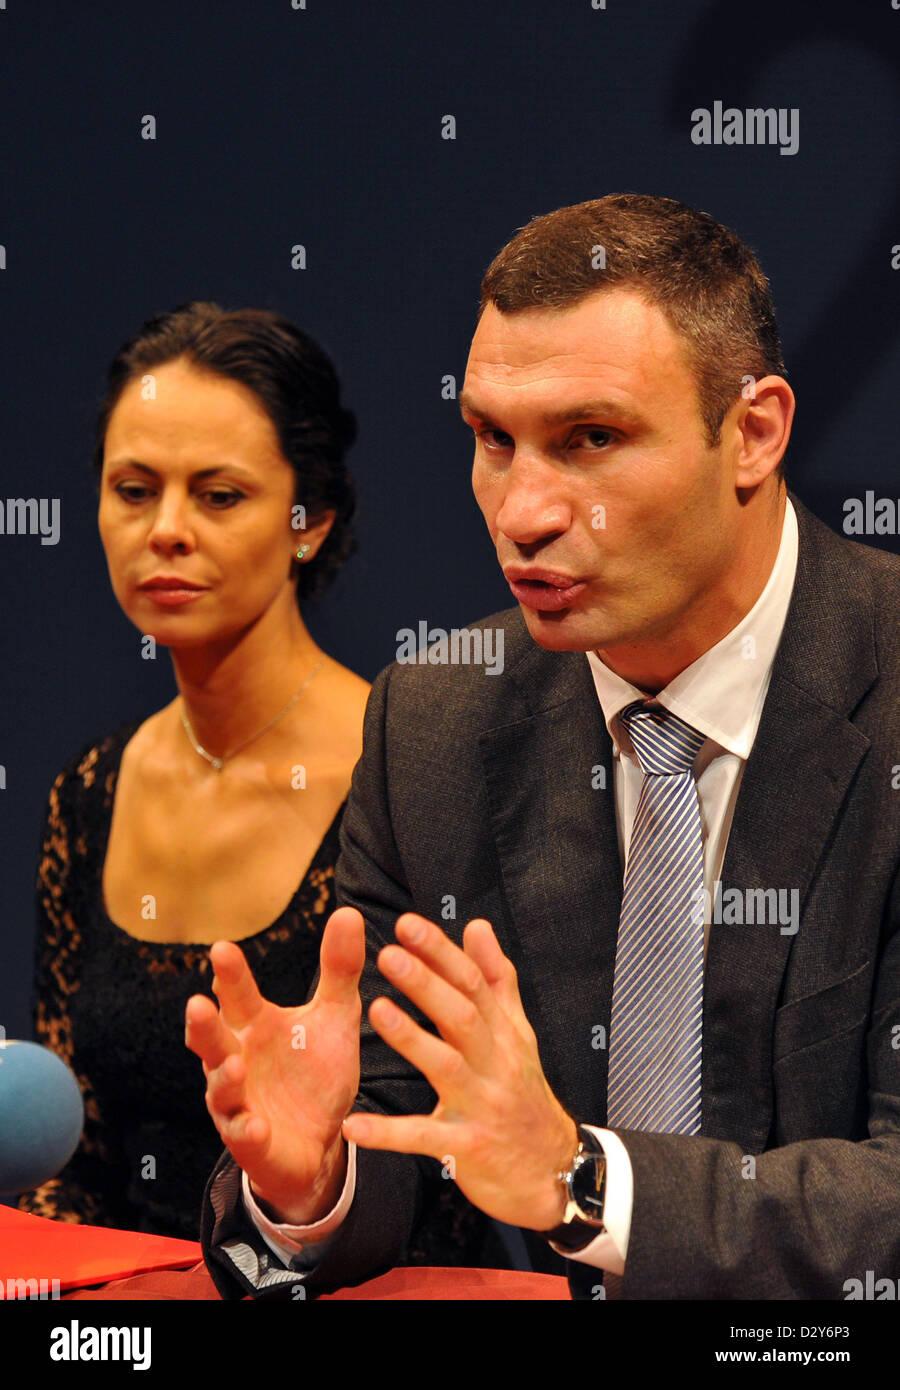 Wife Vitali Klitschko Natalia Klitschko Stock Photos & Wife